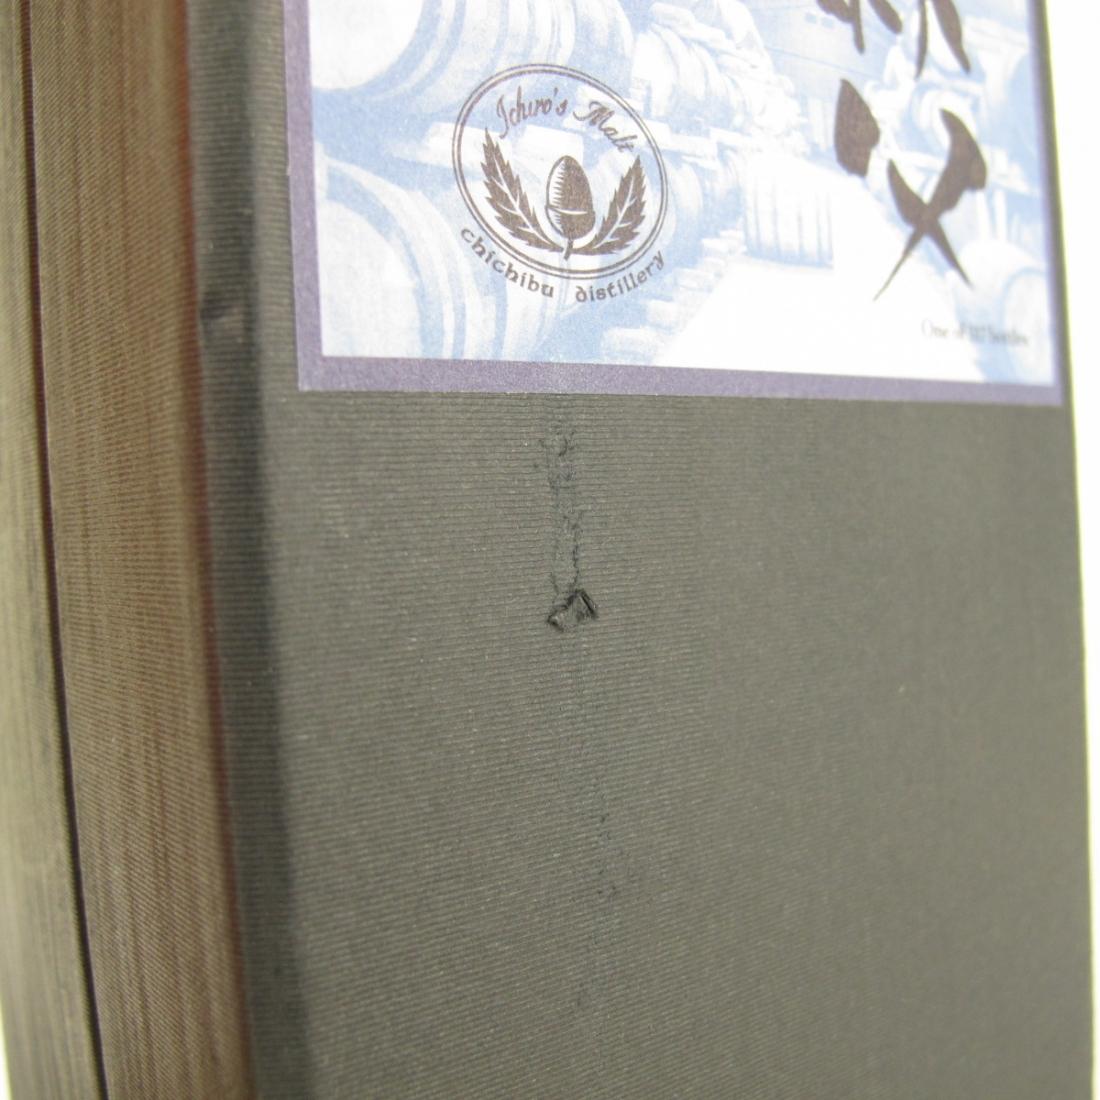 Chichibu 2010 Ichiro's Malt Single Cask #707 / The Whisky House Exclusive